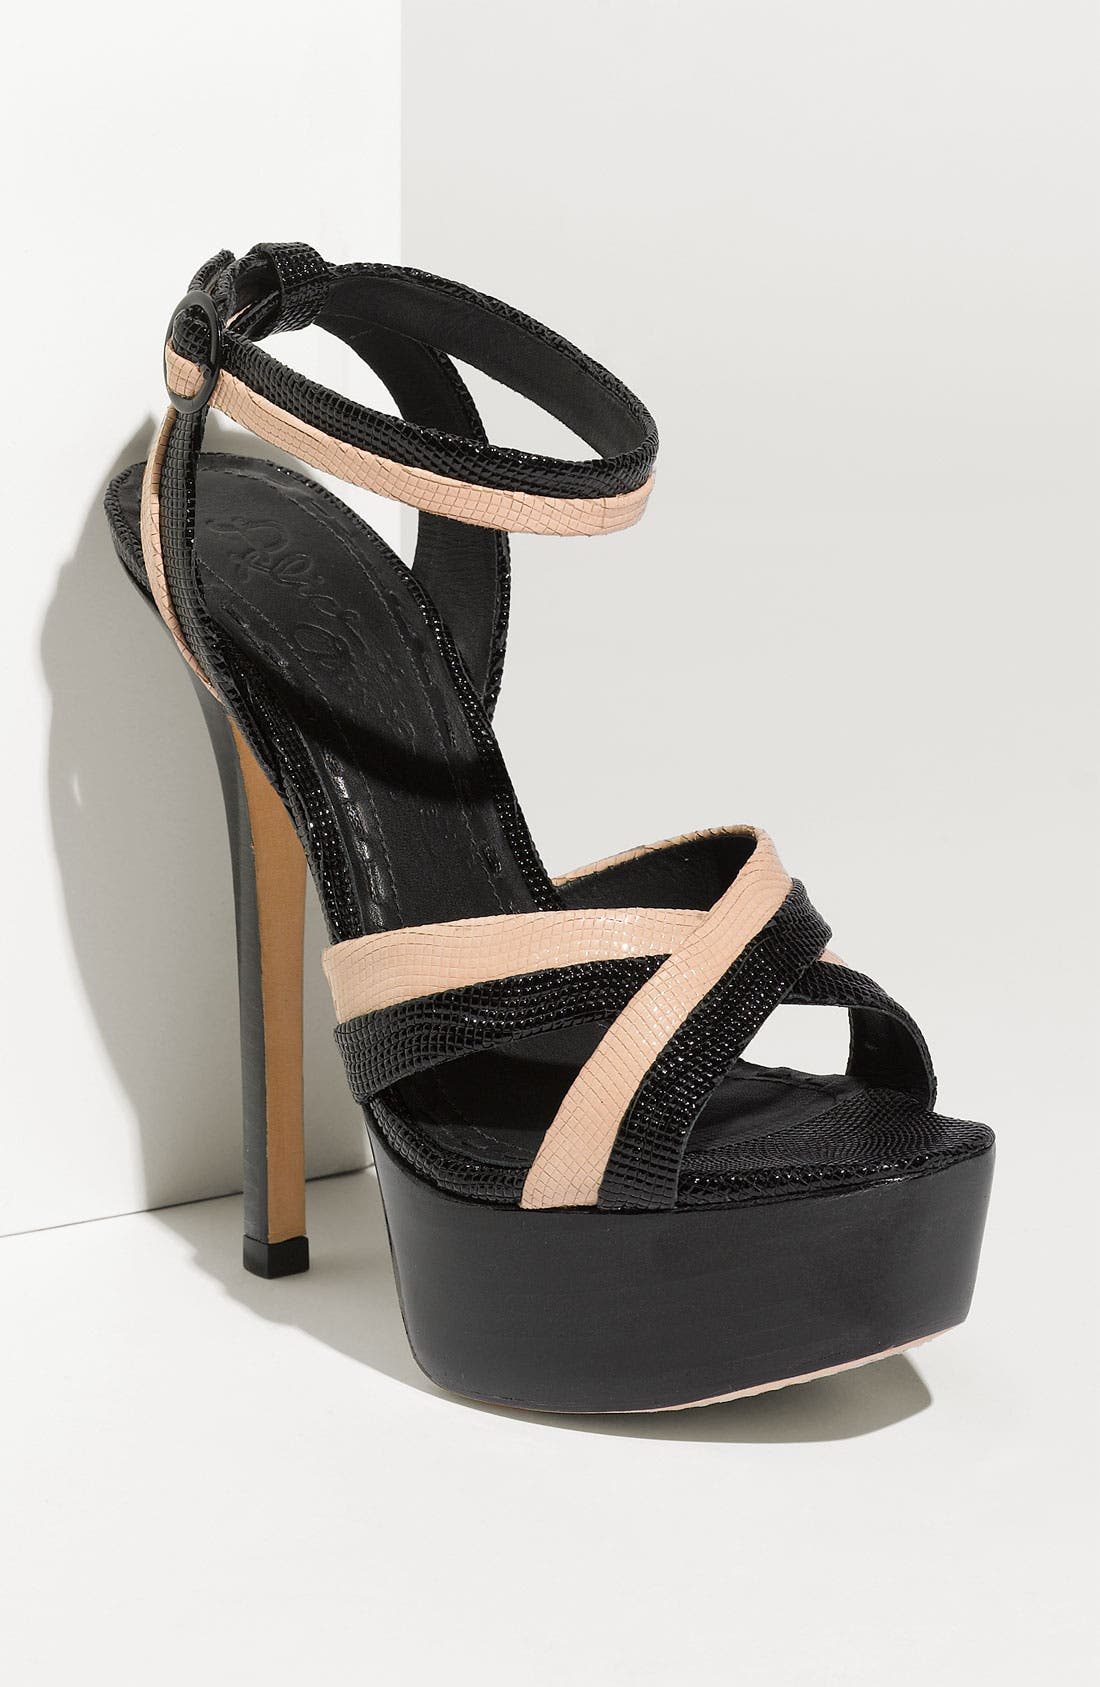 Main Image - Alice + Olivia 'Lizabeth' Sandal